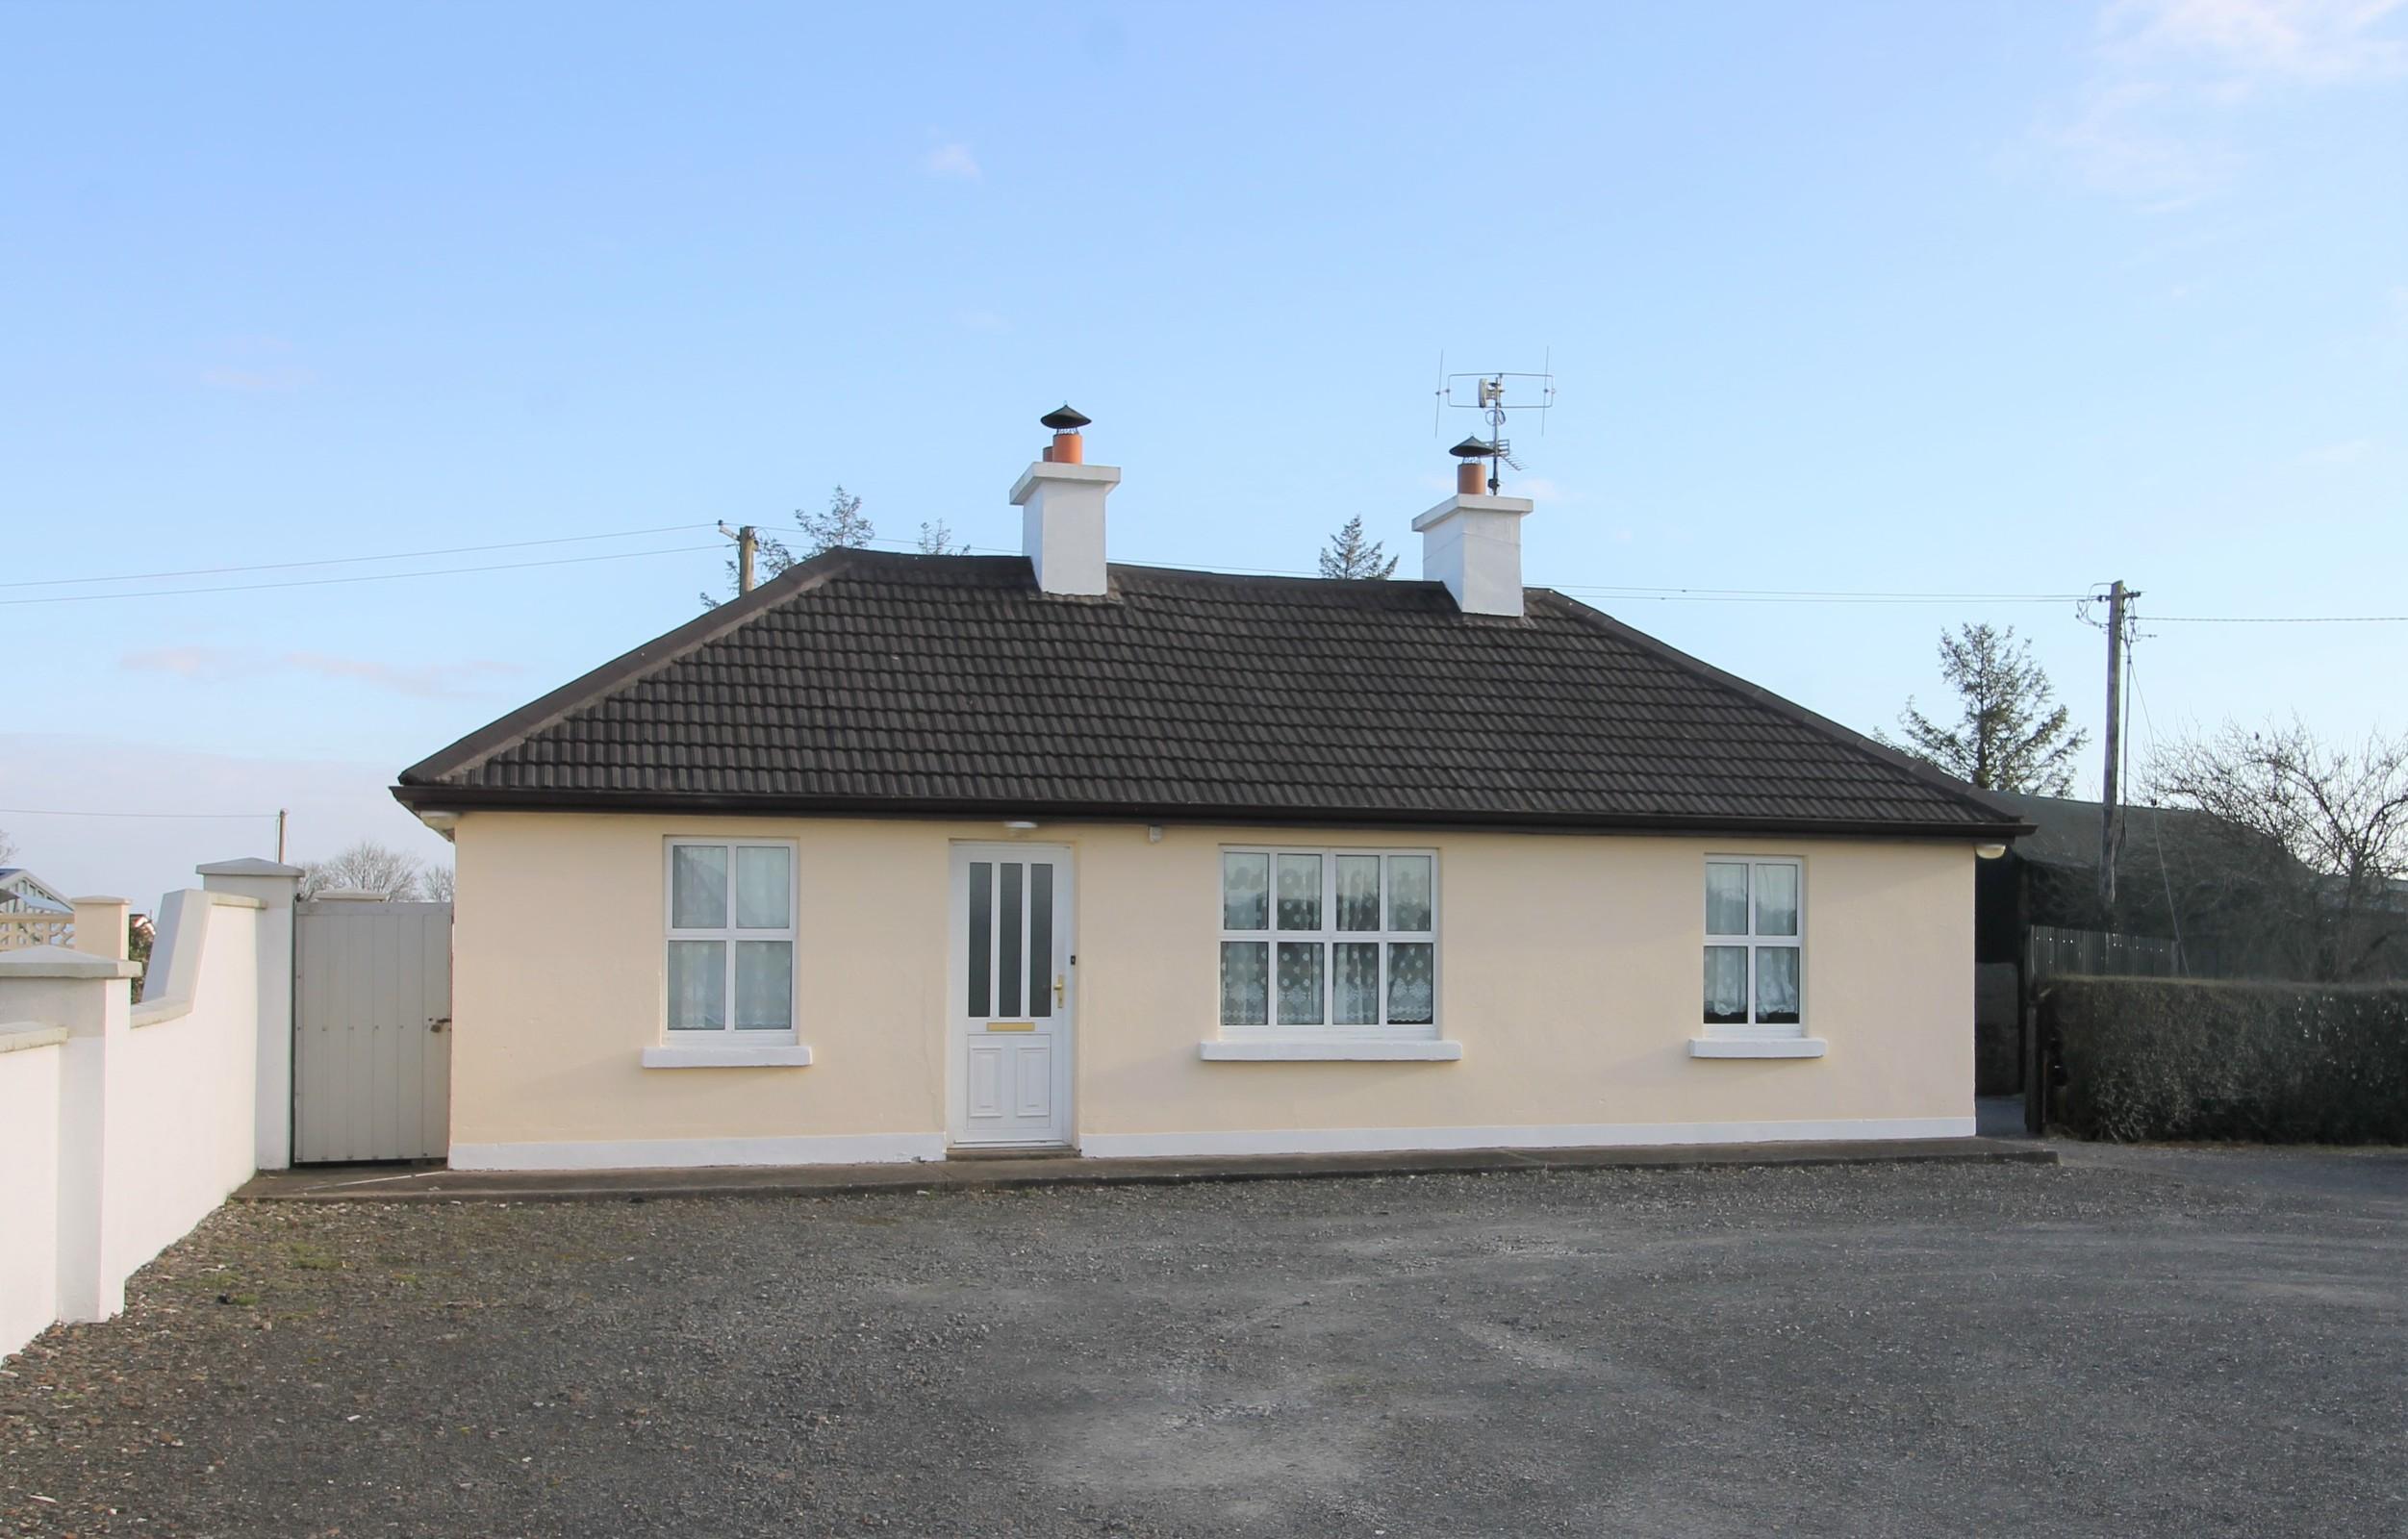 Kilfithmone, Borrisoleigh, Co. Tipperary